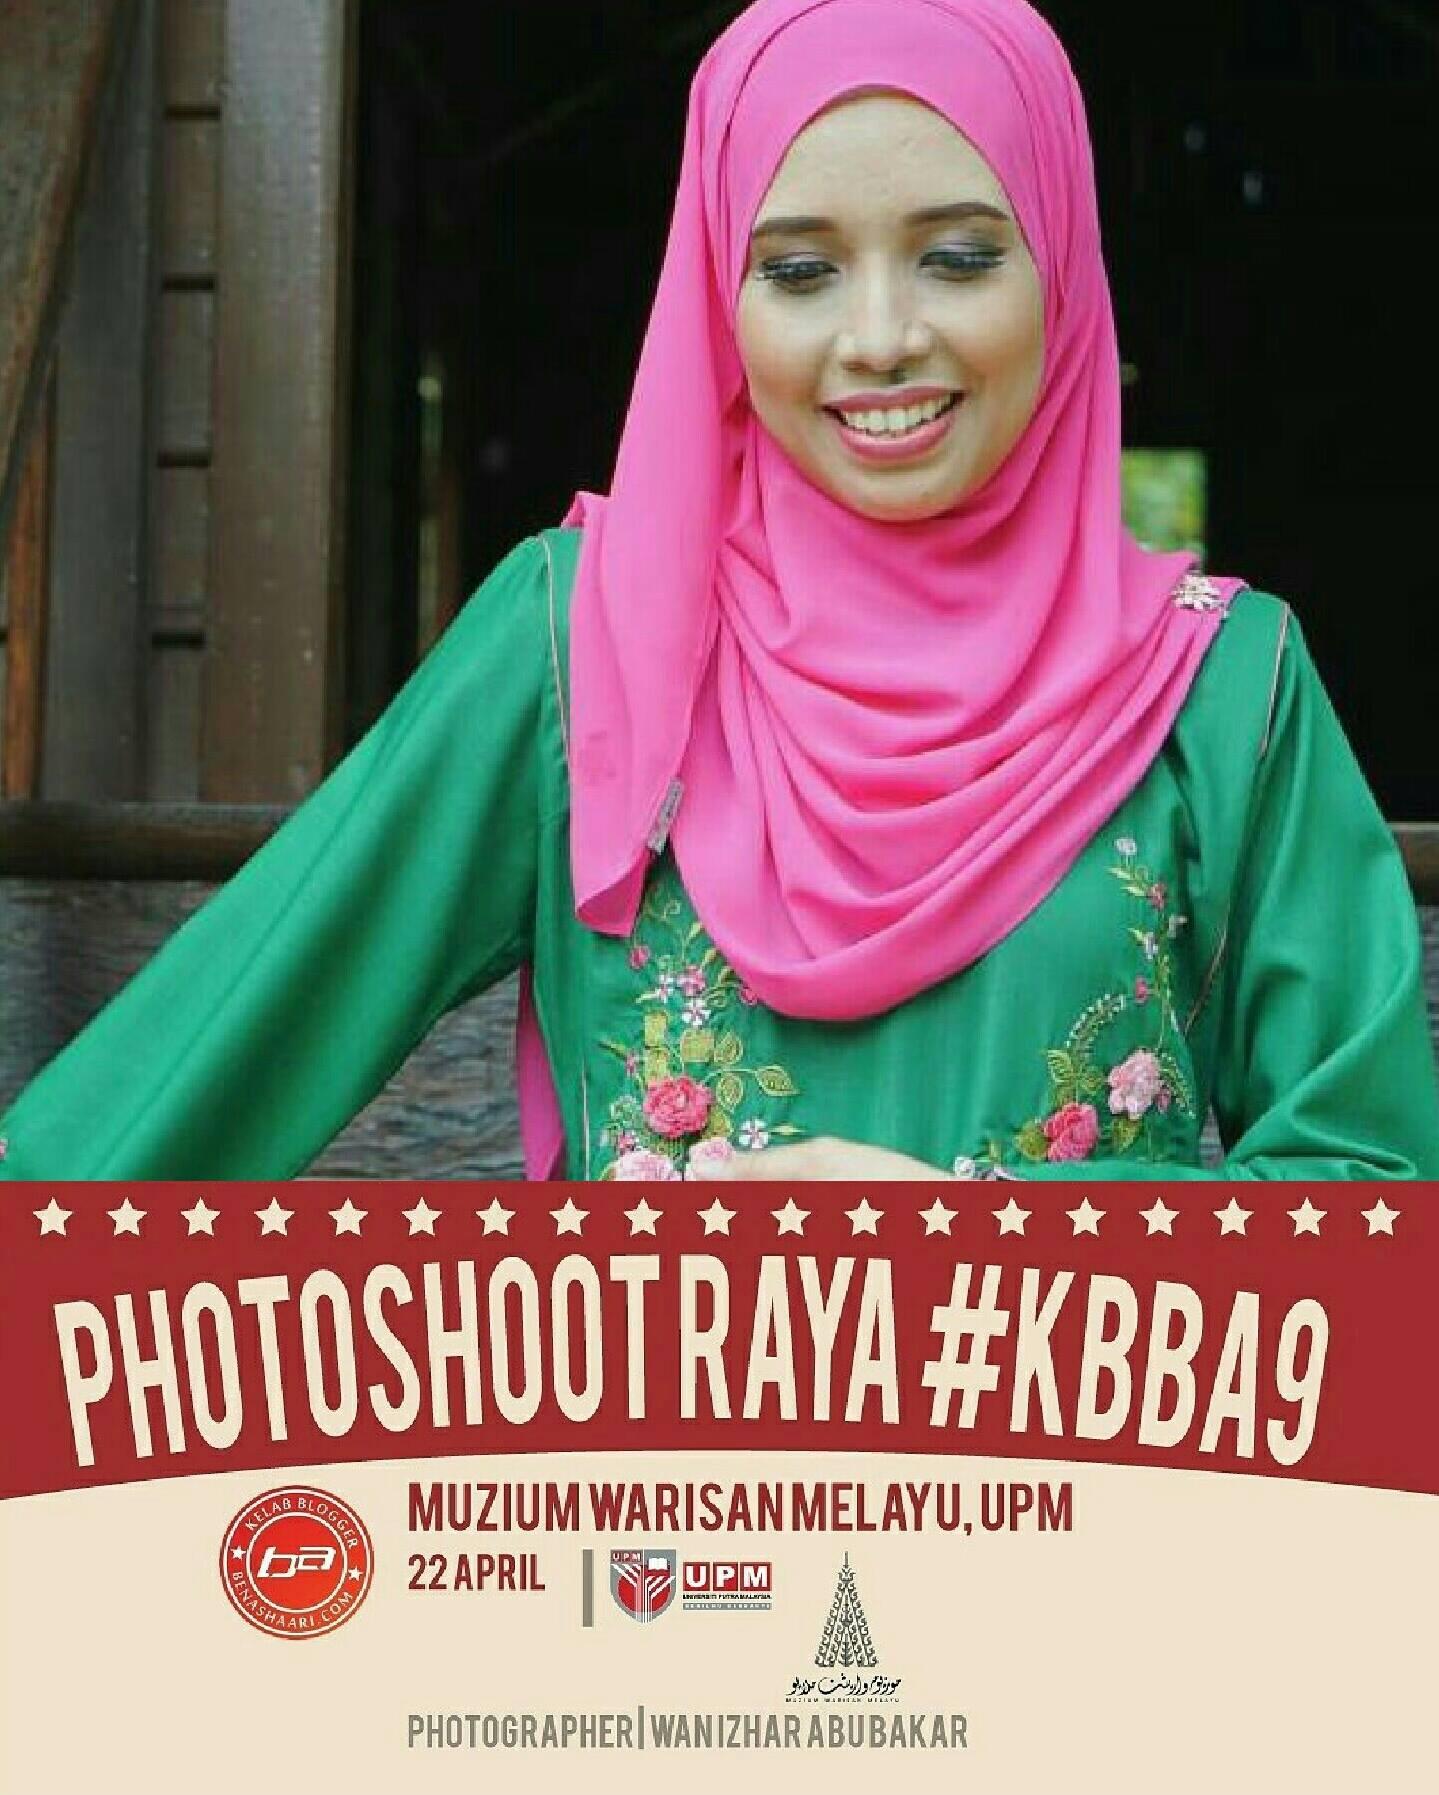 PHOTOSHOOT RAYA KBBA9 2017 - 1